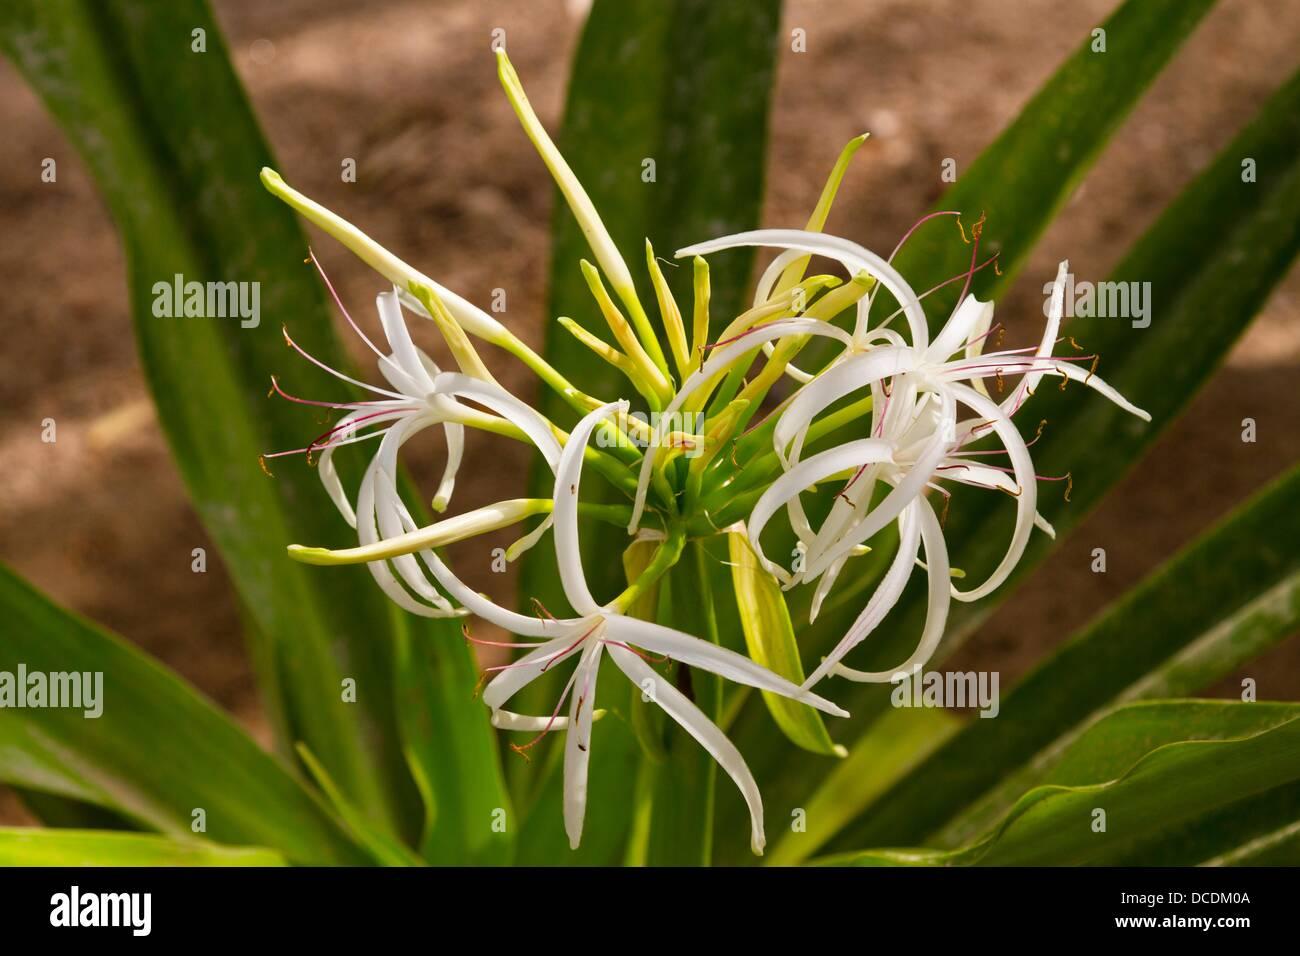 The spider lily flower in creek park dubai uae stock photo the spider lily flower in creek park dubai uae izmirmasajfo